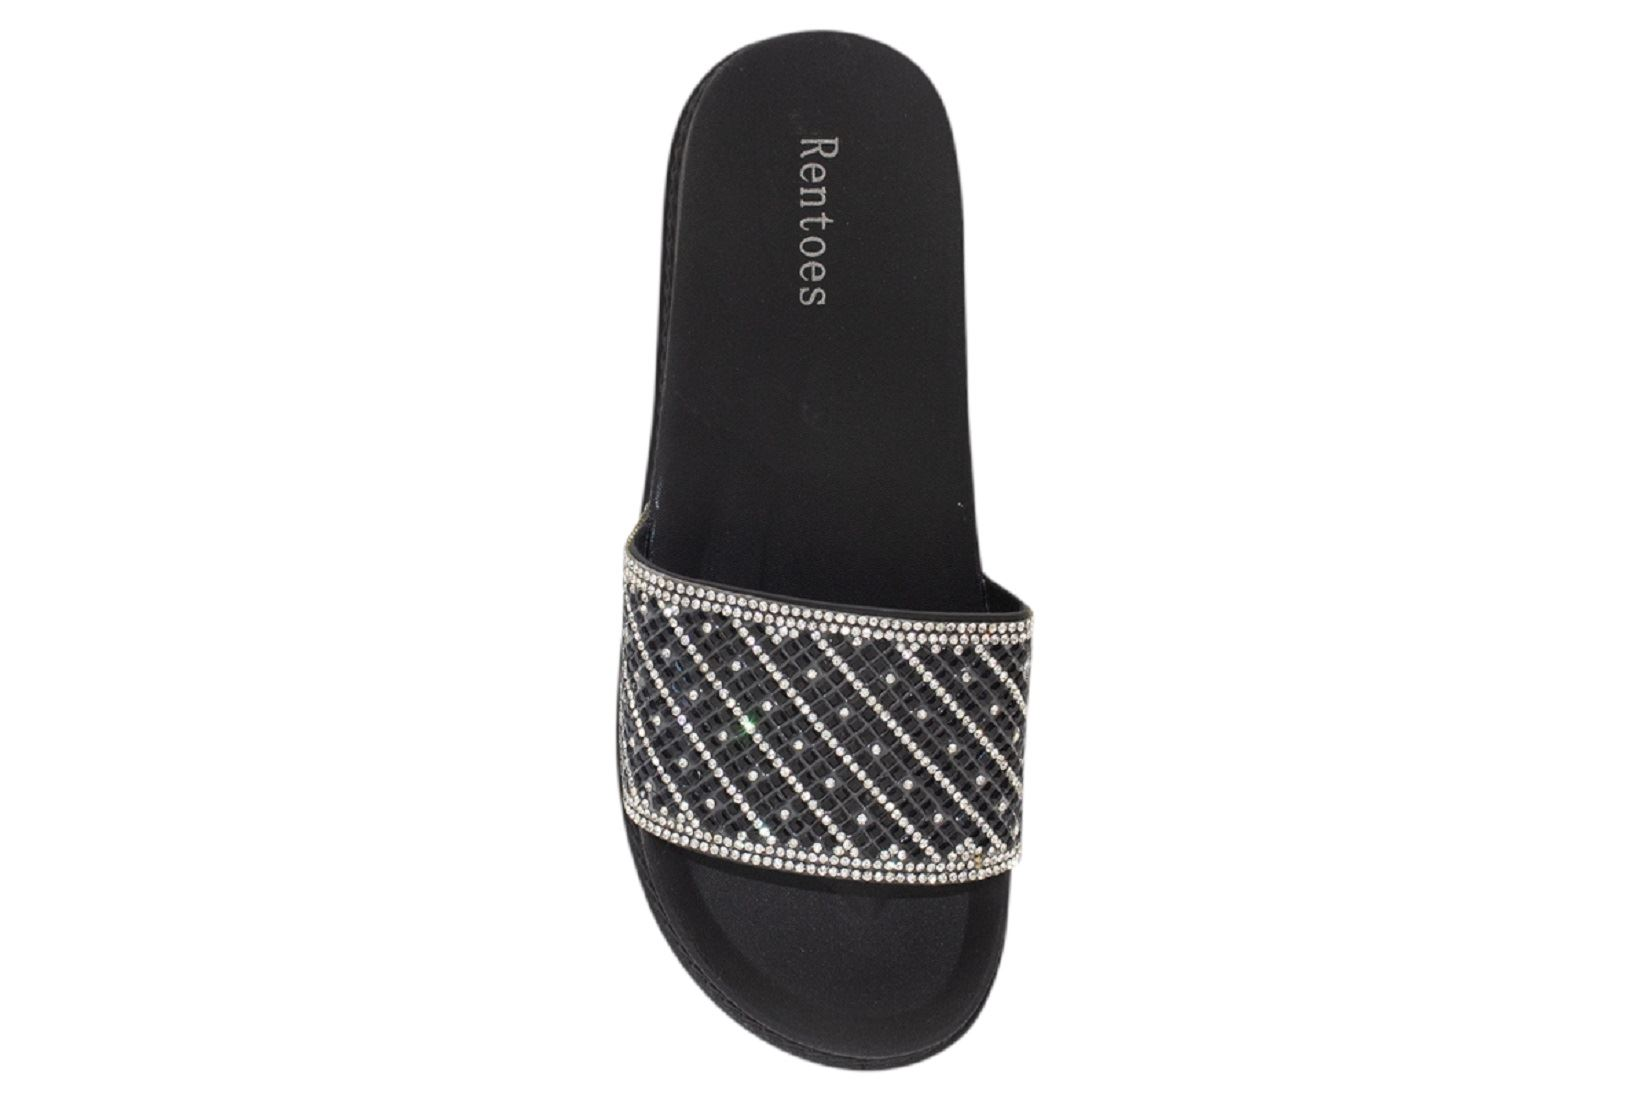 Womens-Sliders-Casual-Slippers-Mules-Ladies-Diamante-Flip-Flop-Sandals-Shoes thumbnail 80